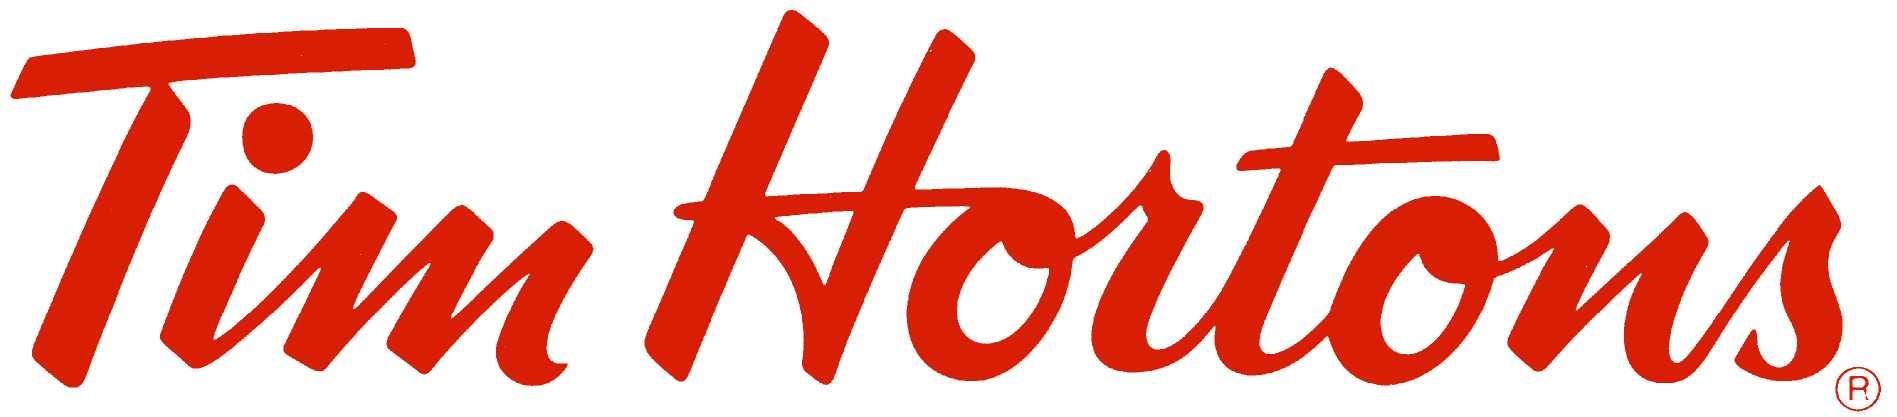 Tim Hortons – Red